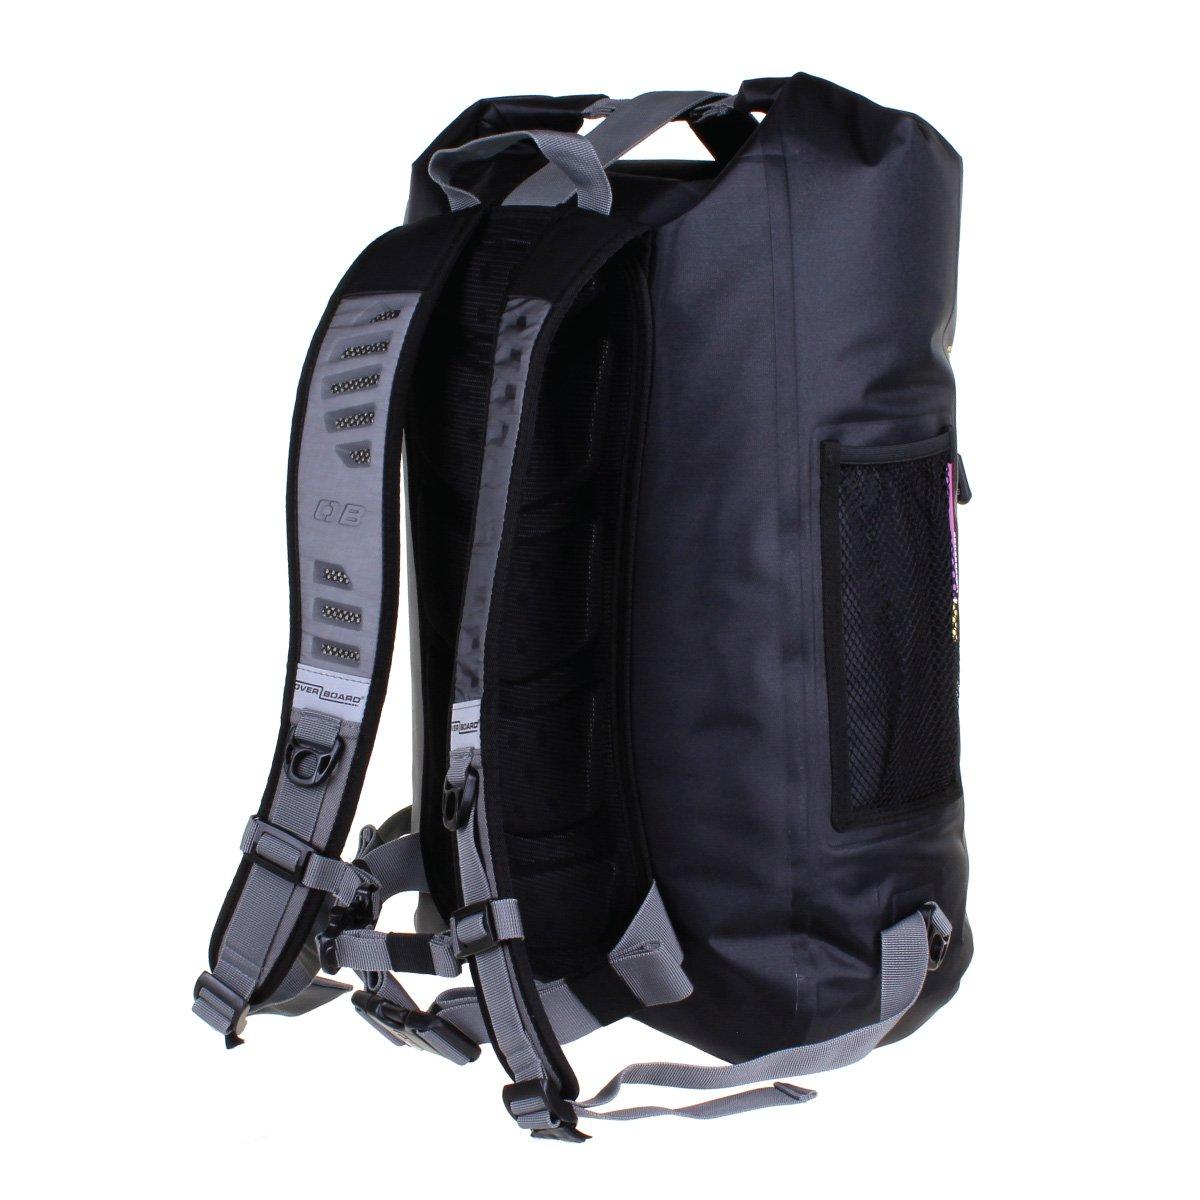 3fed1f4a2349 Pro Light Waterproof Backpack 20 Litres- Fenix Toulouse Handball